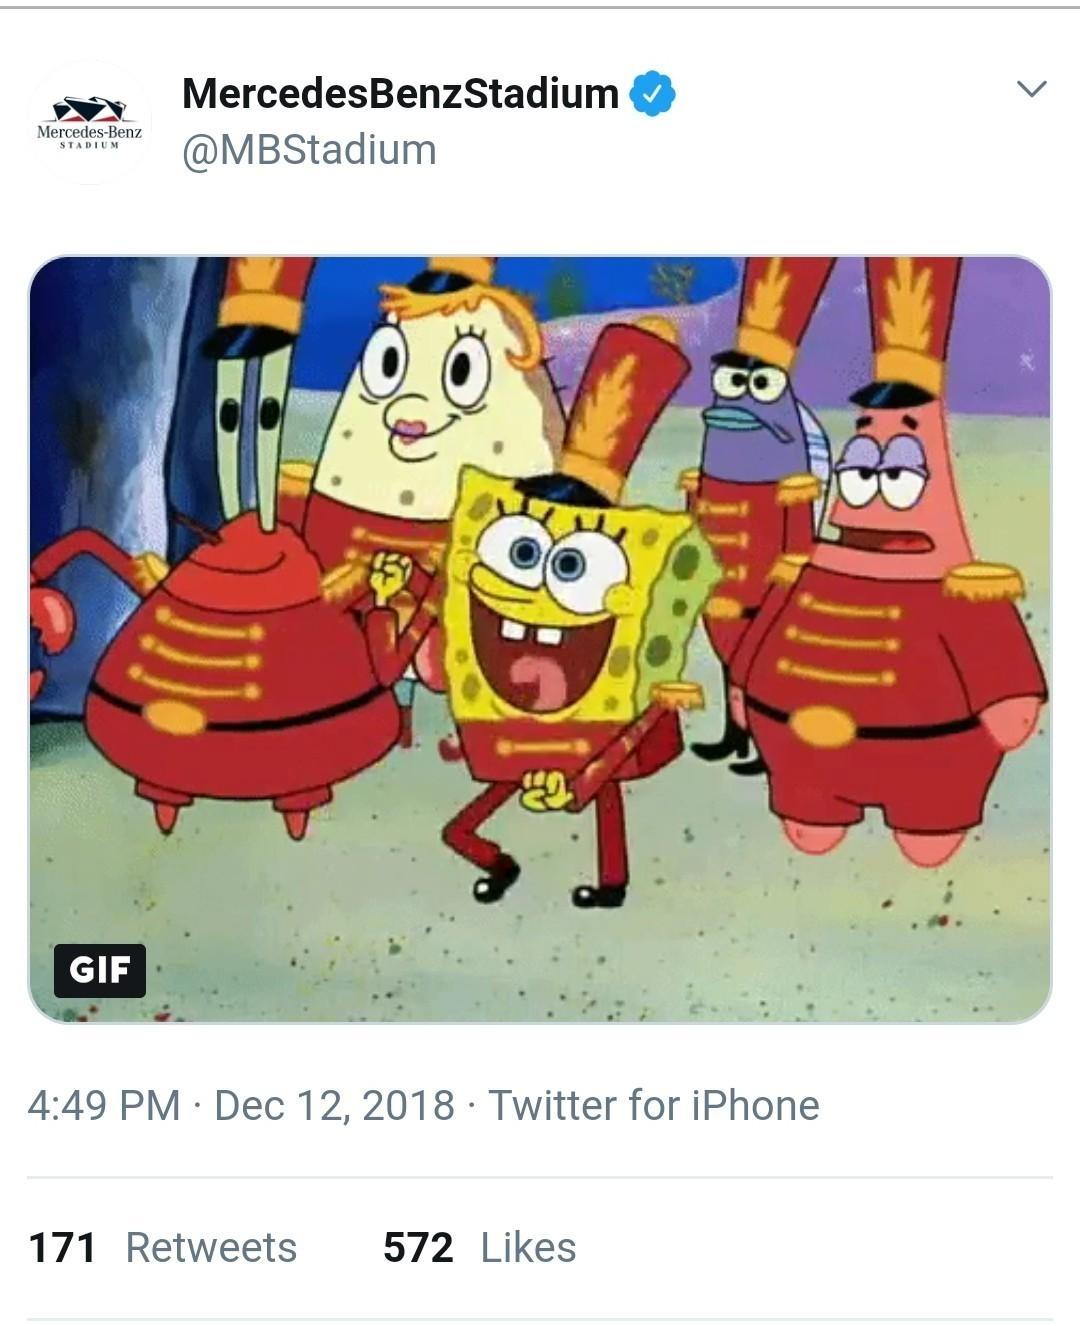 Tweetedmercedes Benz Stadium, Host Of The 2019 Superbowl with Super Bowl 2019 Reddit